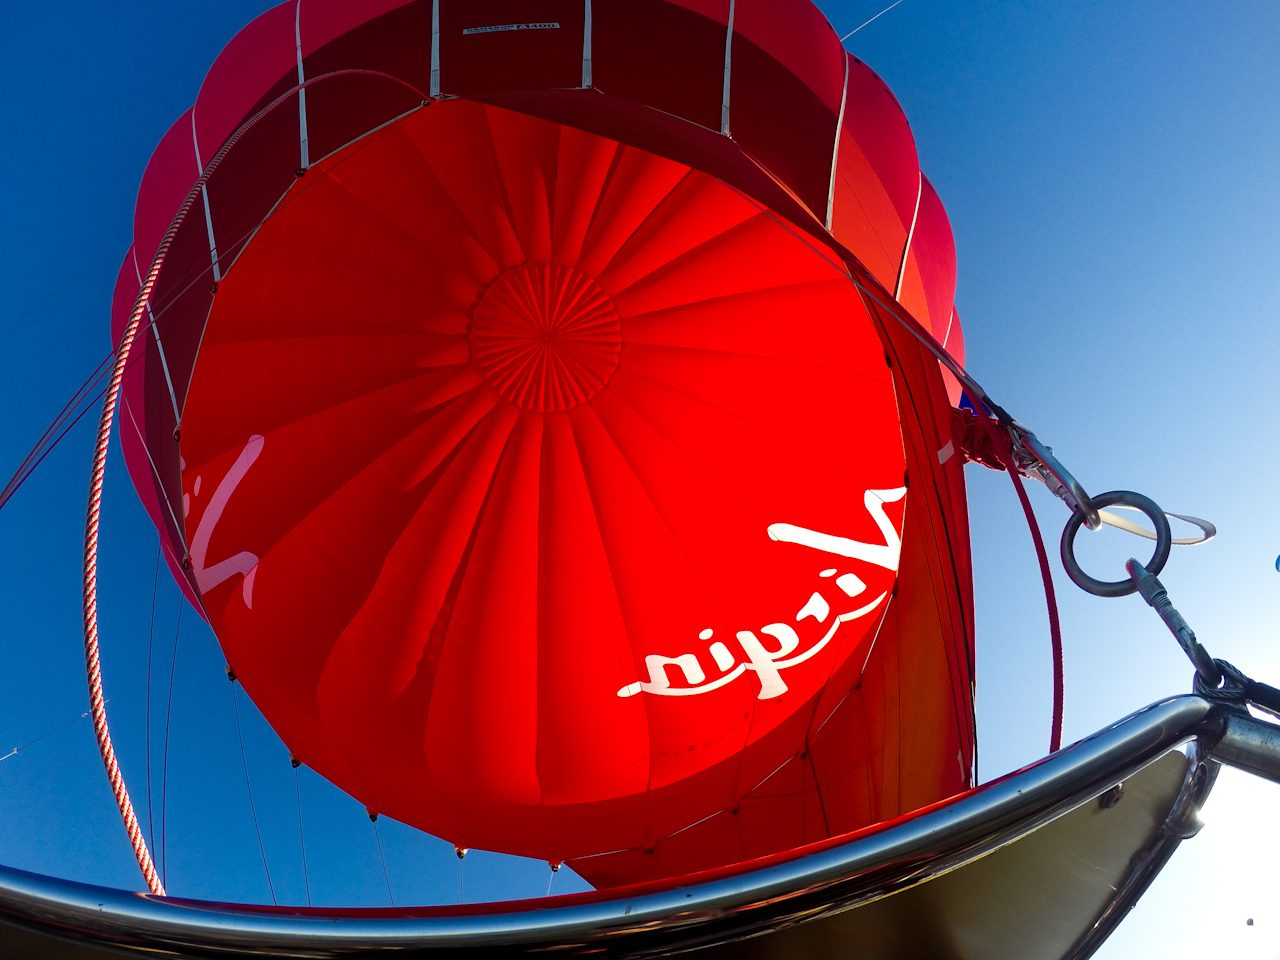 Hot air balloon envelope